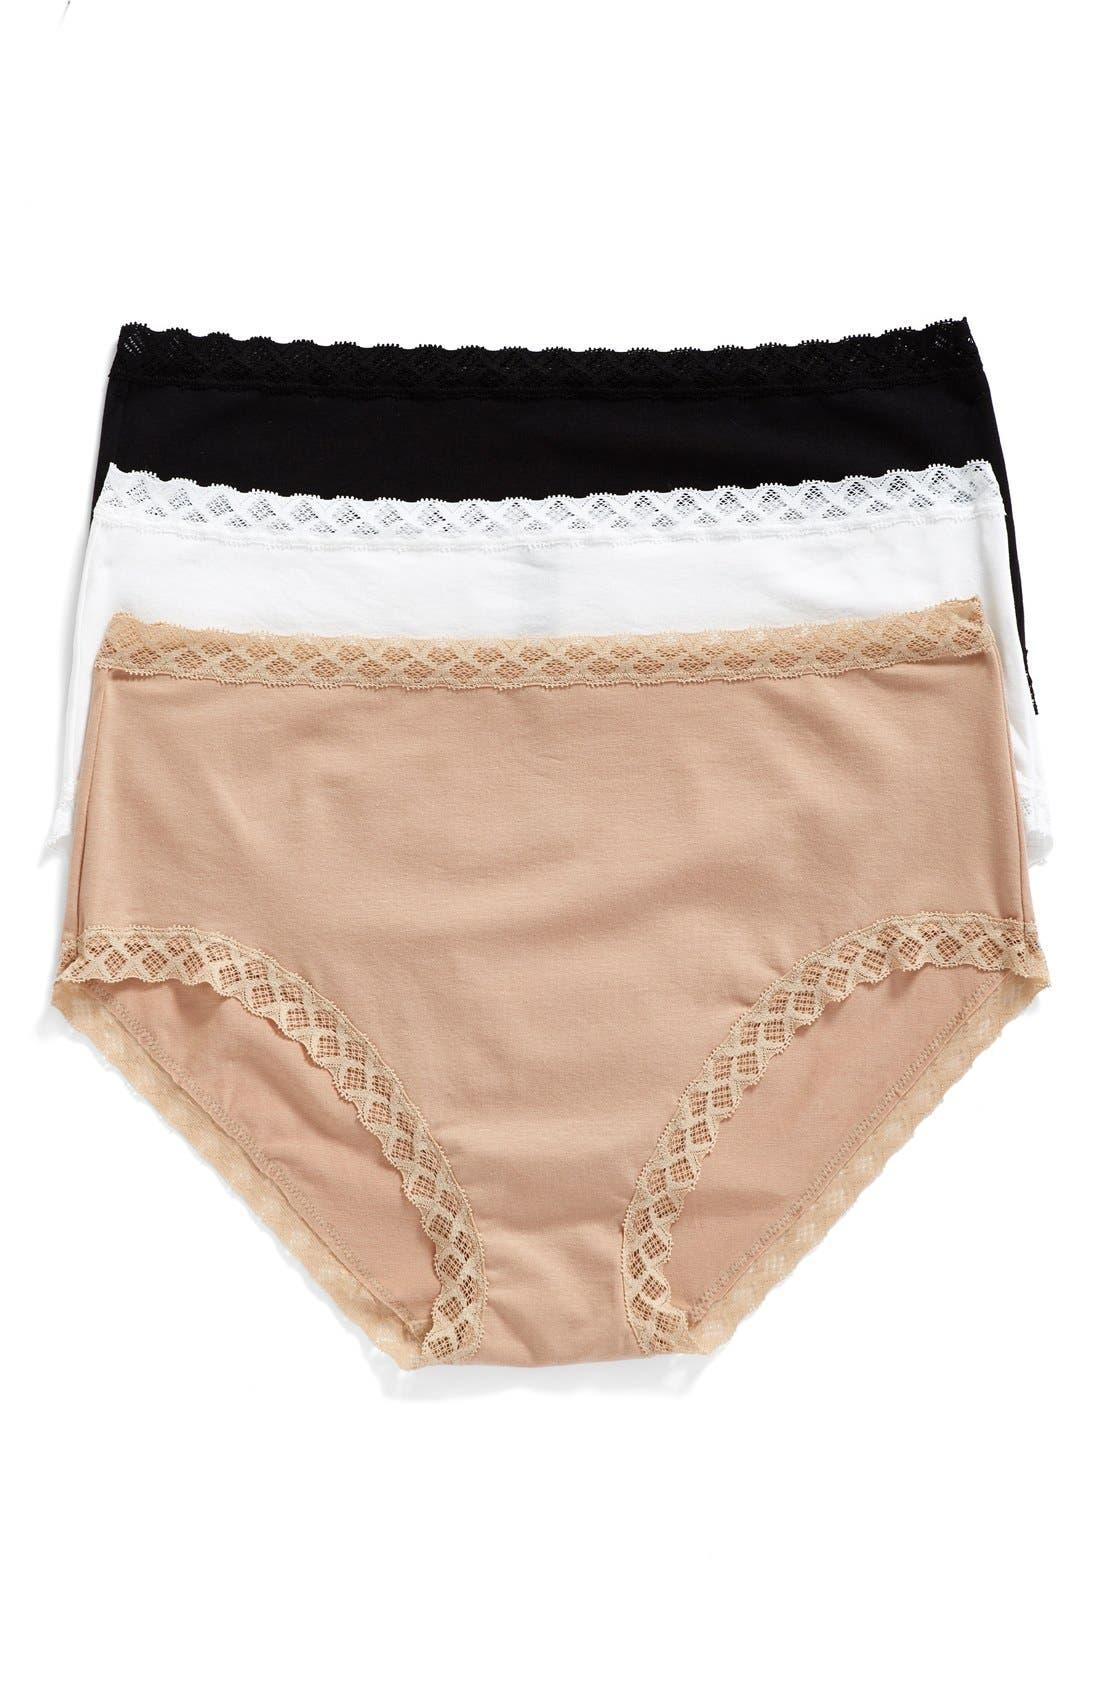 Main Image - Natori Bliss 3-Pack Cotton Full Briefs